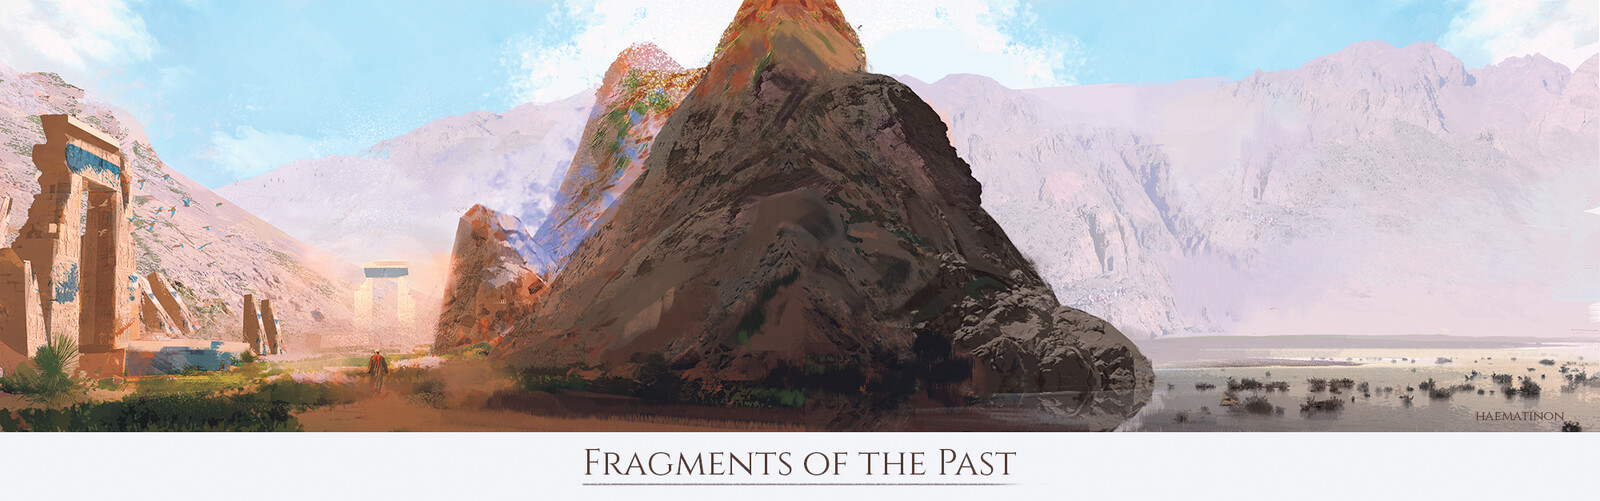 Phoinikobaptos Valley - Mentorship Demo / Fragments of the Past Illustration